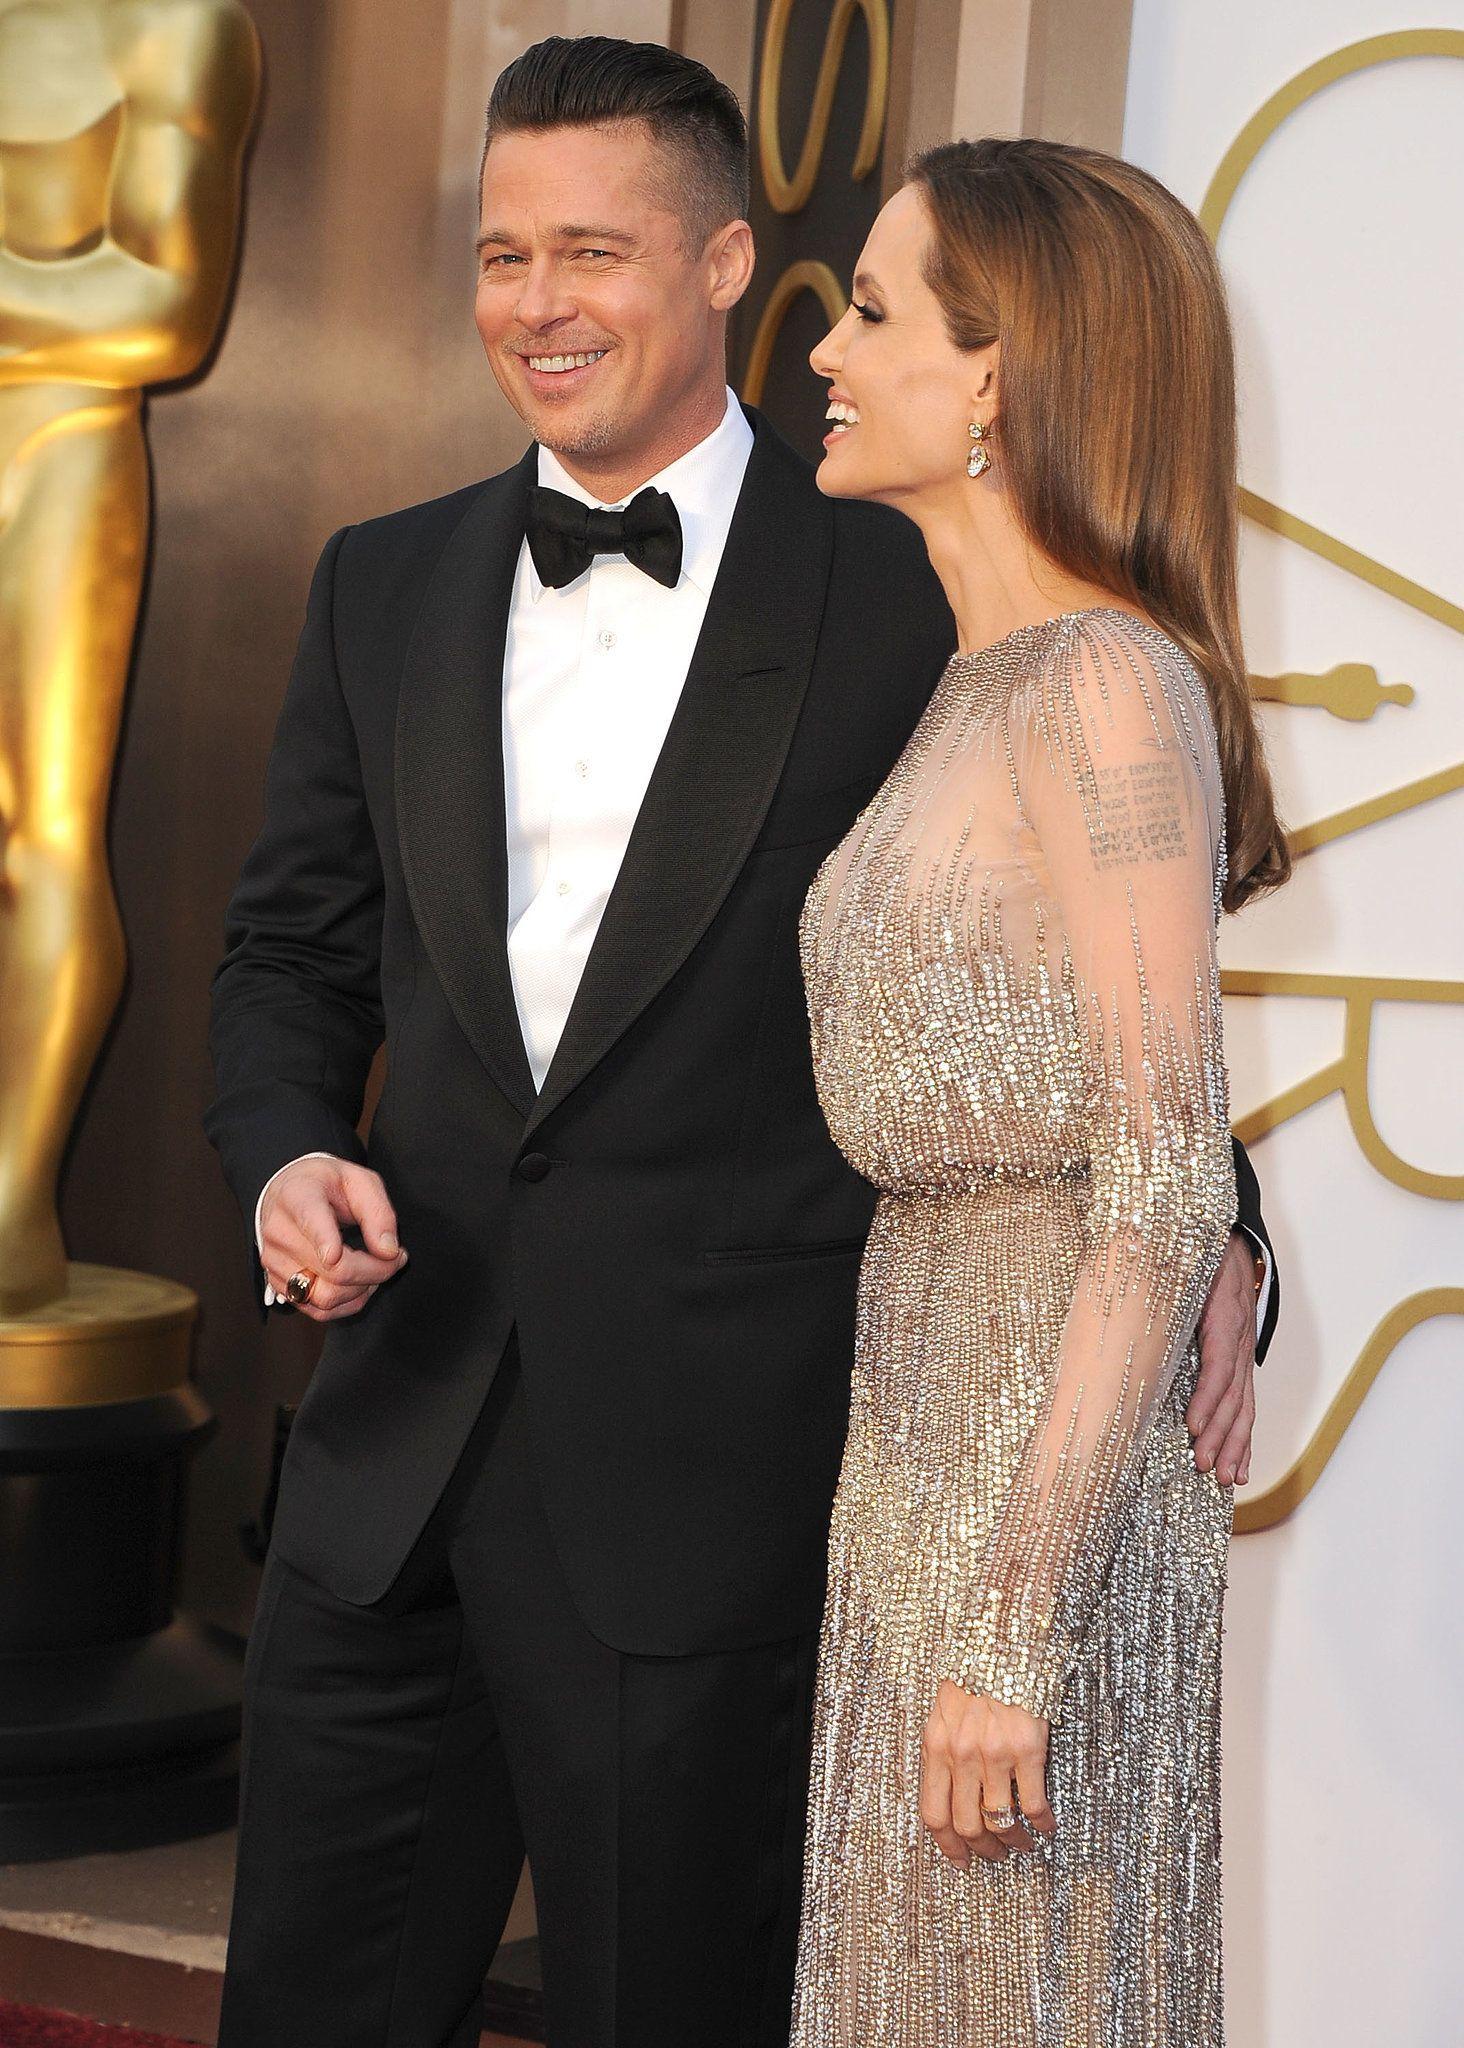 Angelina Jolie Gave Brad Pitt An Adoring Look On The Oscars Red